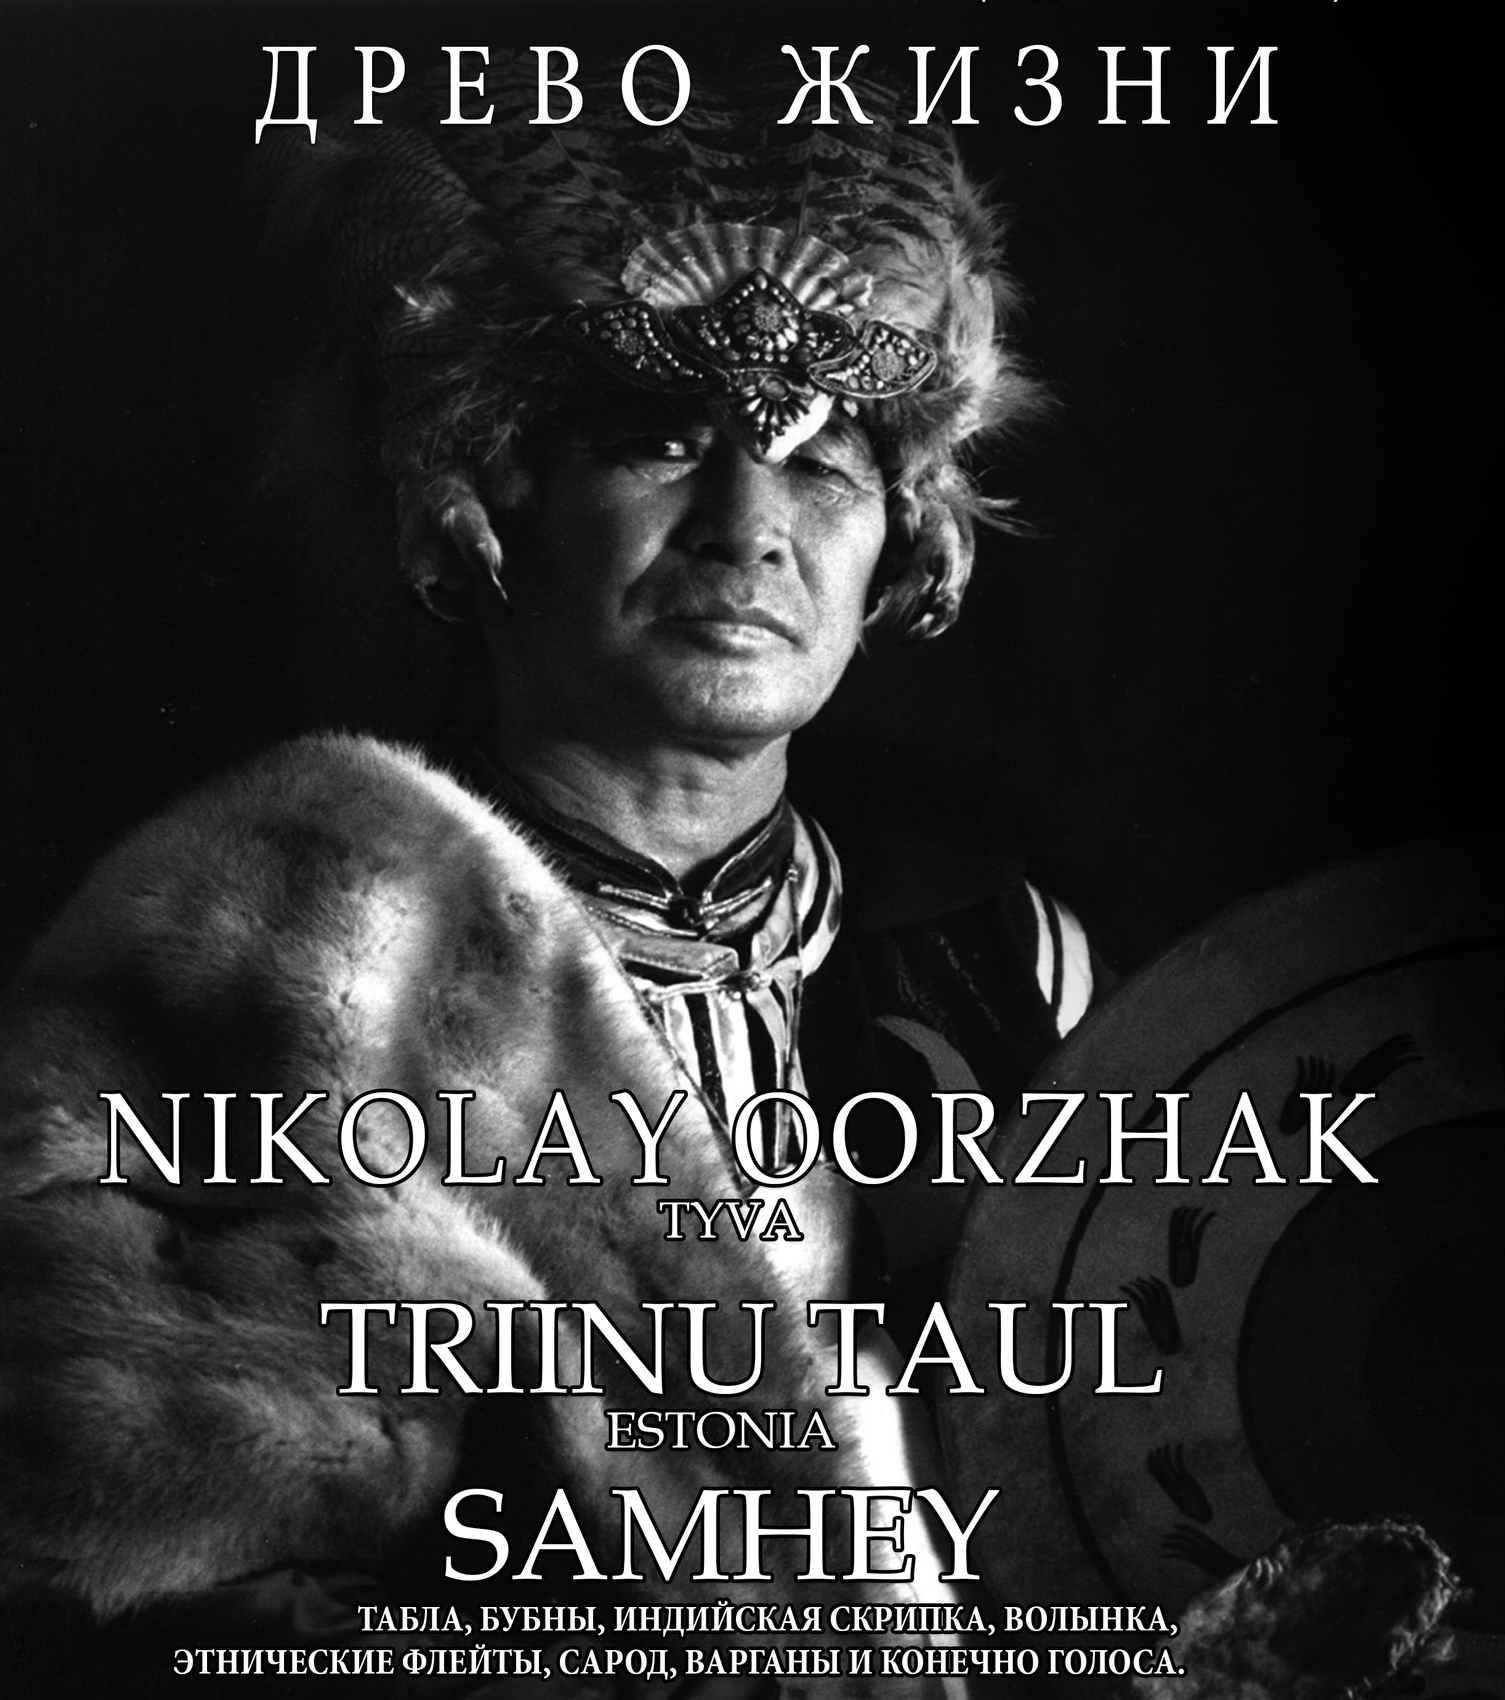 10 Orzhak afisha